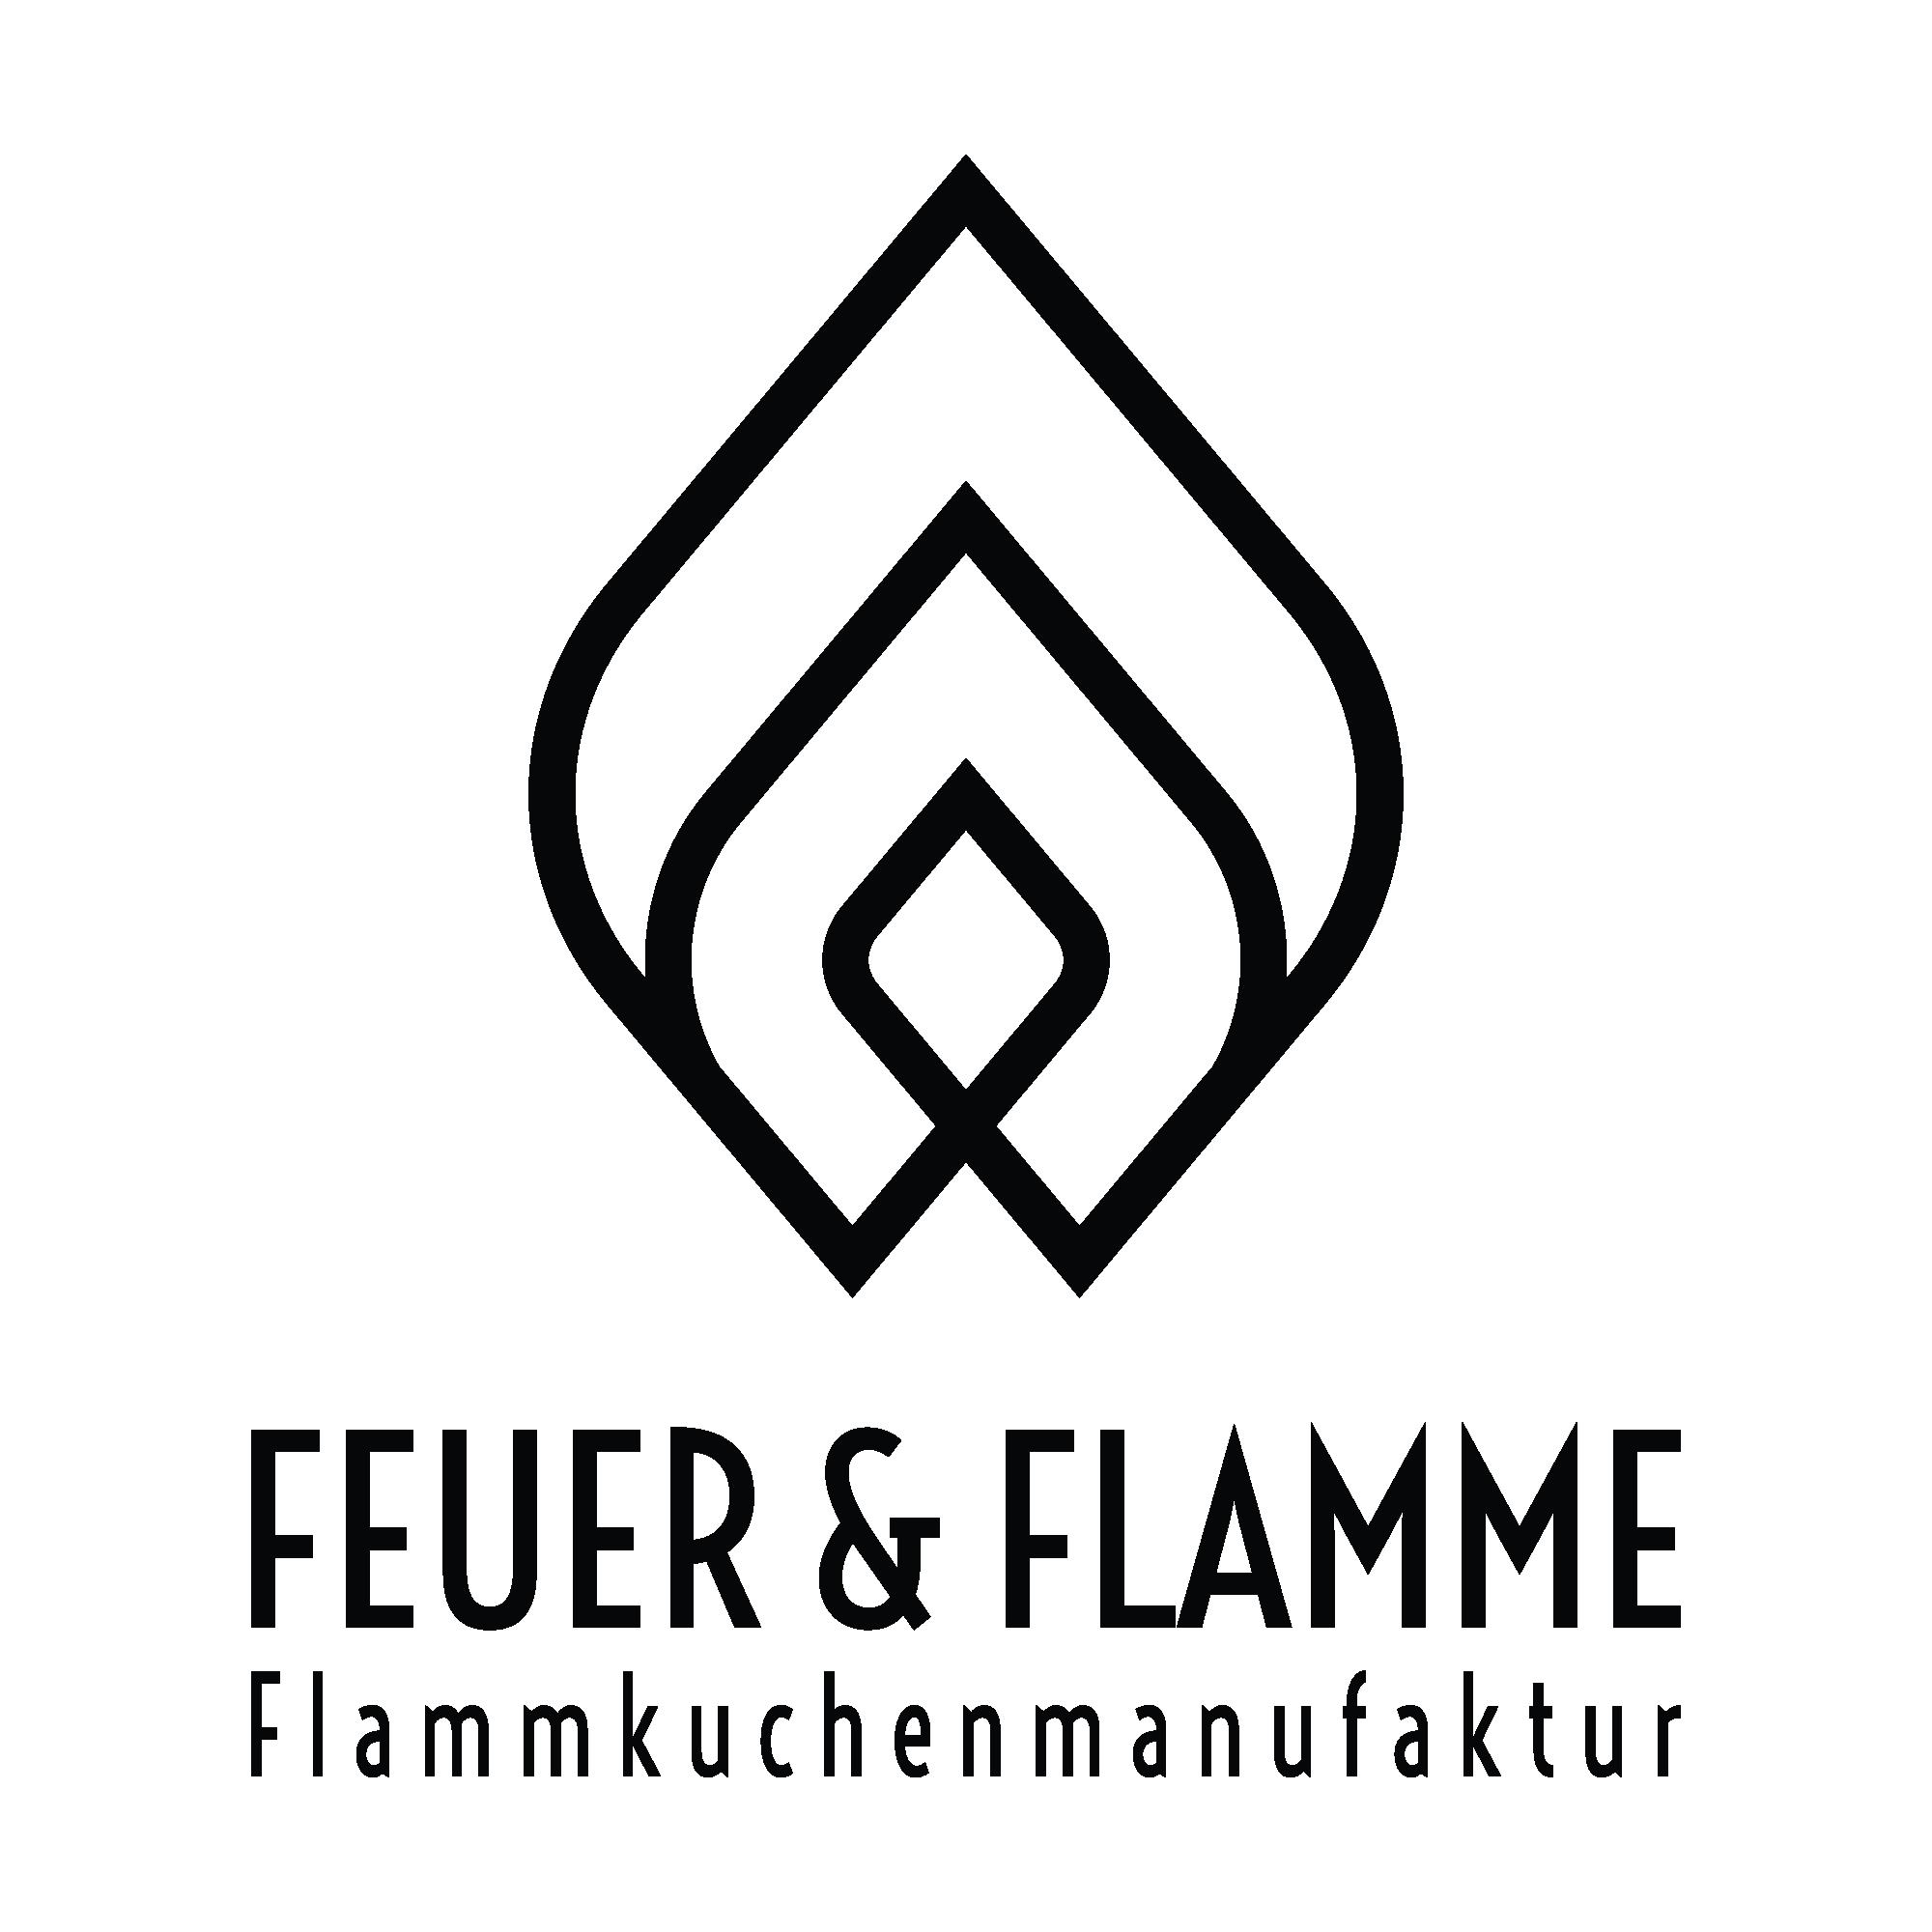 Logo für unsere gehobene Slow-Food Flammkuchenmanufaktur im hippen Szeneviertel Kölns.